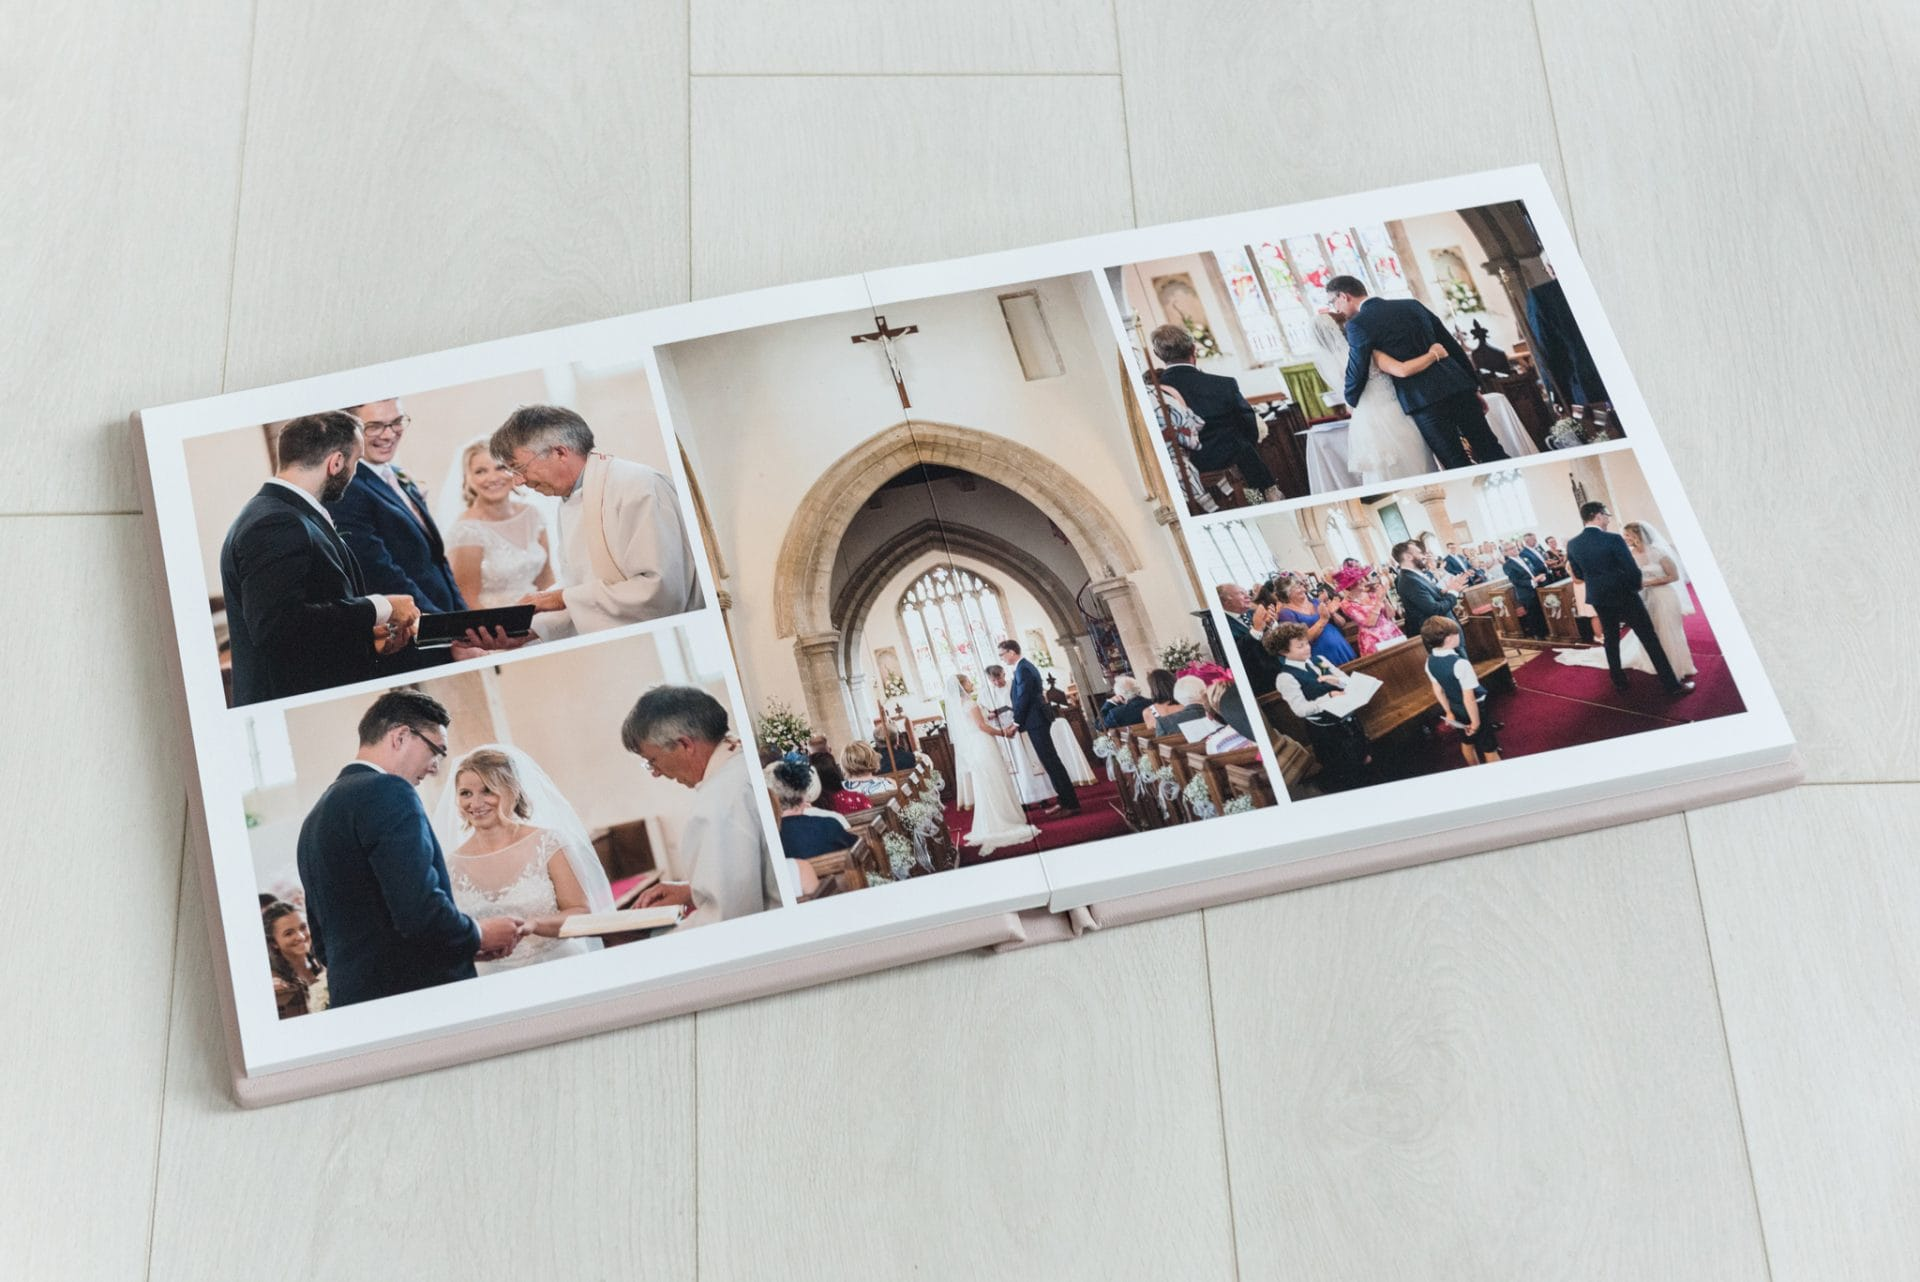 Image printed across centre of a 12x12 fine art album